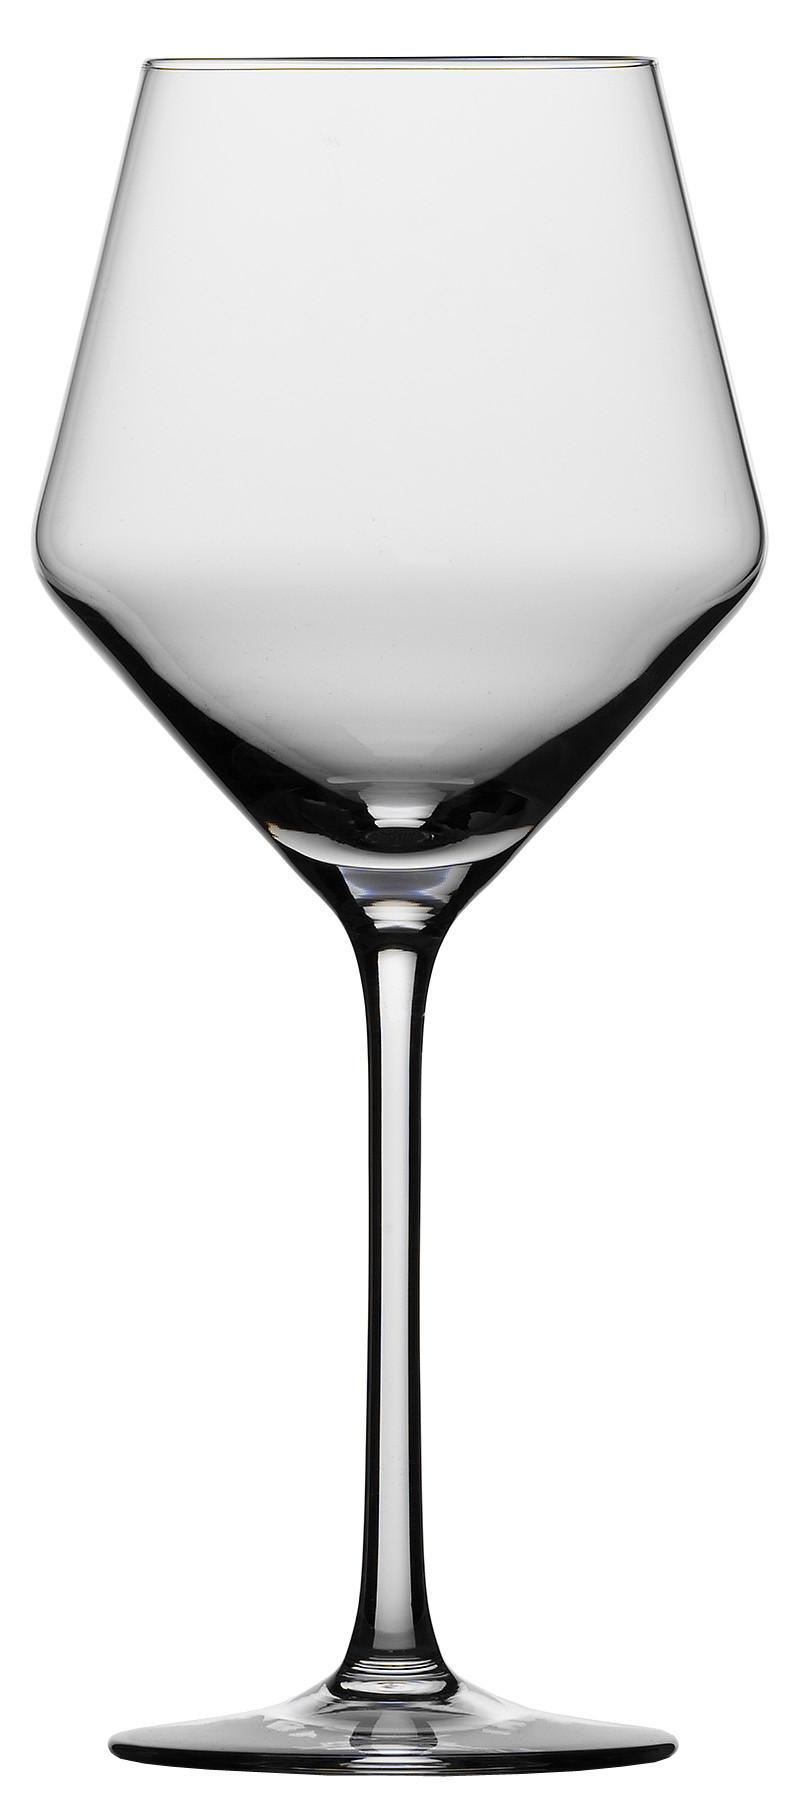 ROTWEINGLAS - Klar, Basics, Glas (0,9/22,2cm) - SCHOTT ZWIESEL